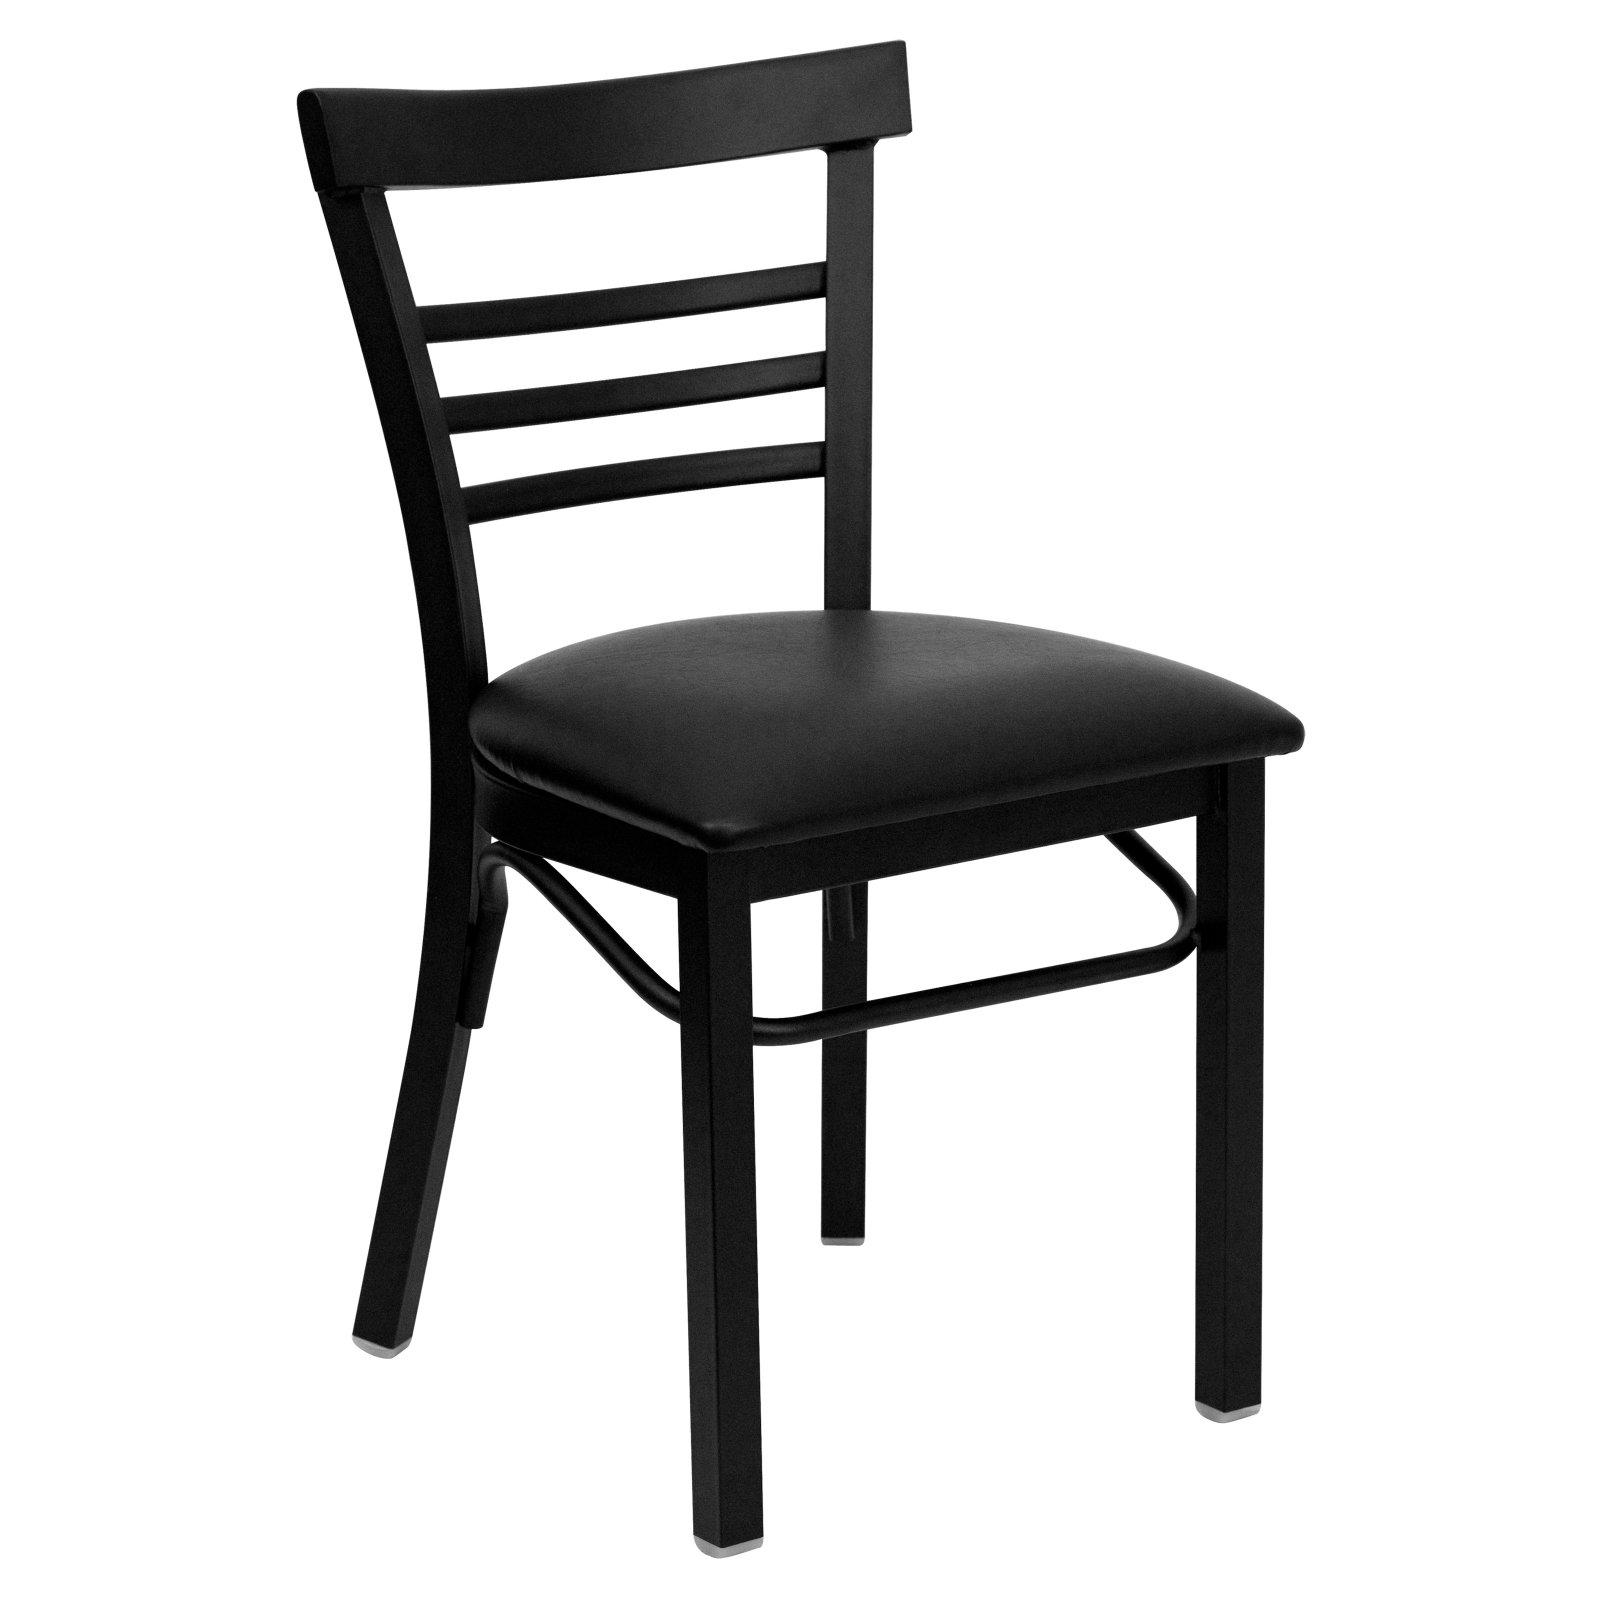 Flash Furniture HERCULES Series Black Ladder Back Metal Restaurant Chair, Vinyl Seat, Multiple Colors